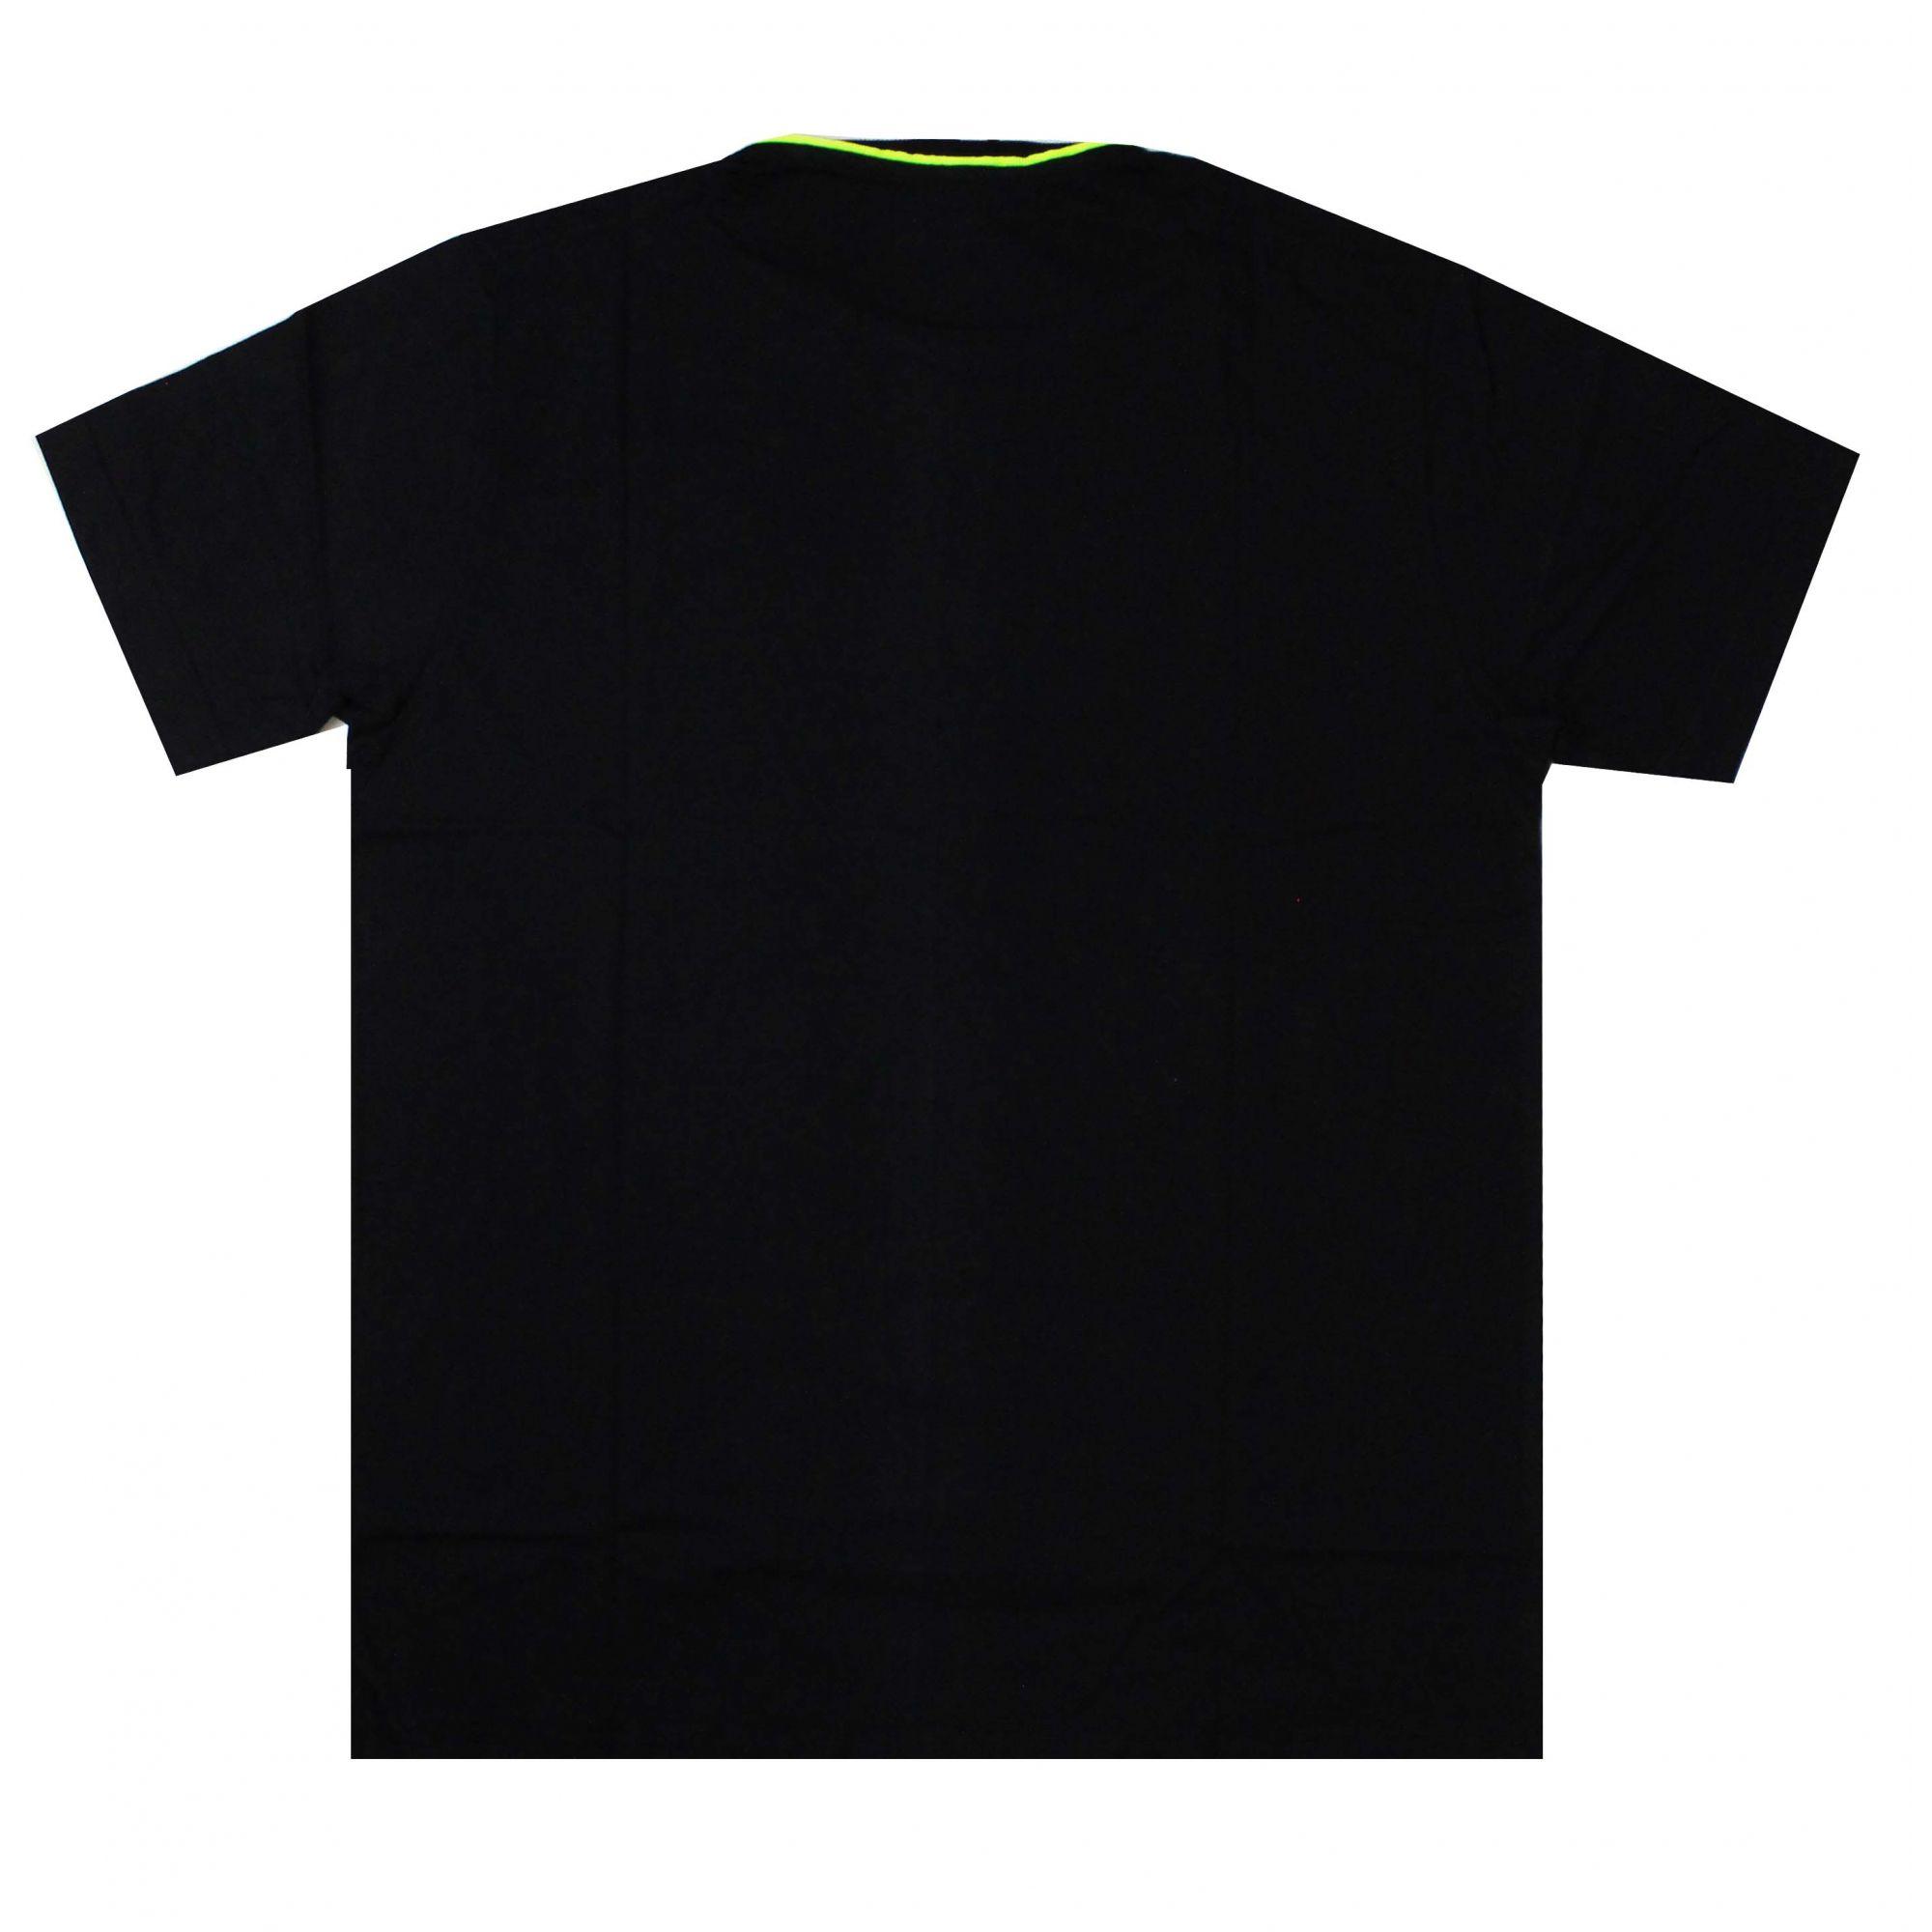 Camiseta Drop Dead Reflex Crew Preto